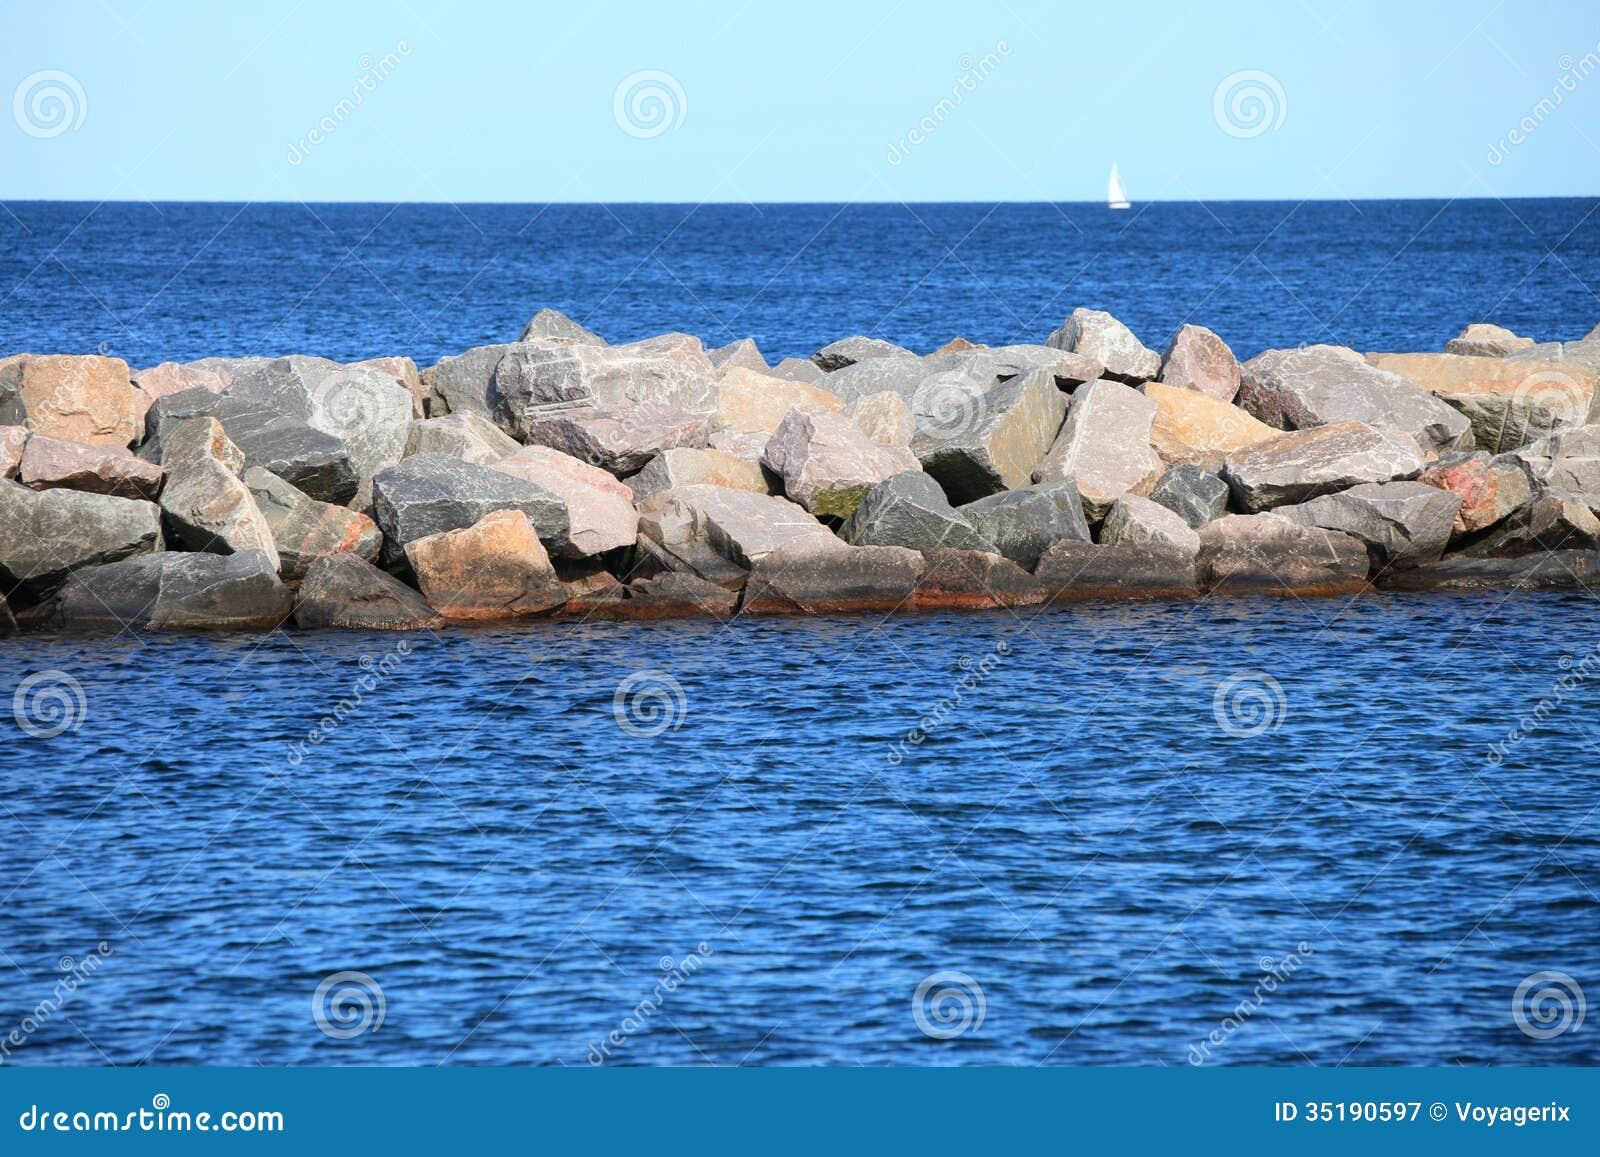 Granite Block Seawall : Stone breakwater for protection of coast royalty free